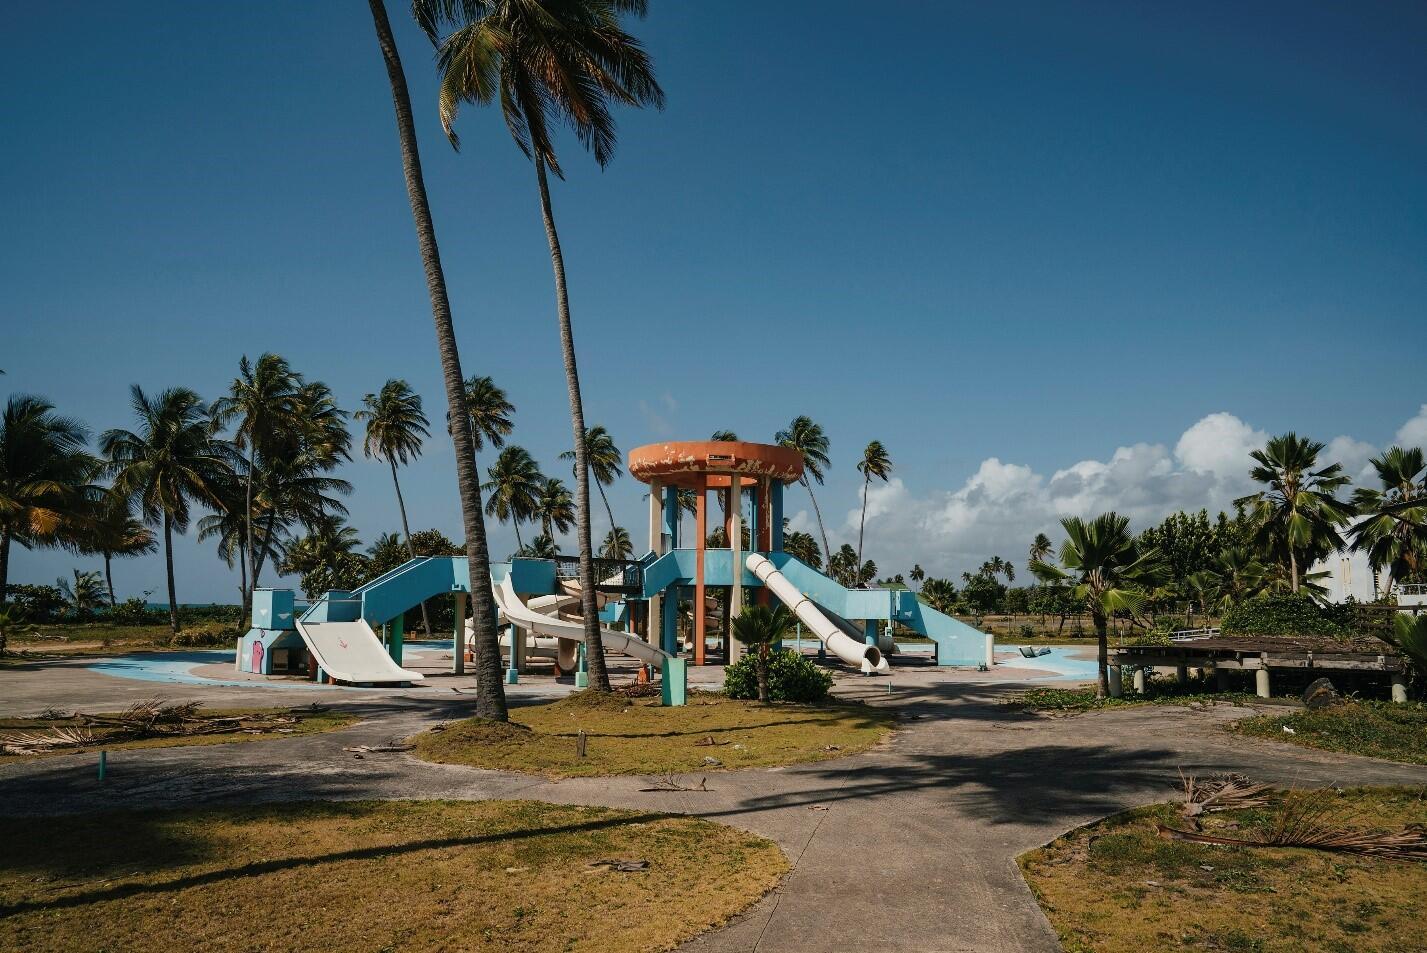 Aquatic park in Punta Santiago with palm trees surrounding the park.